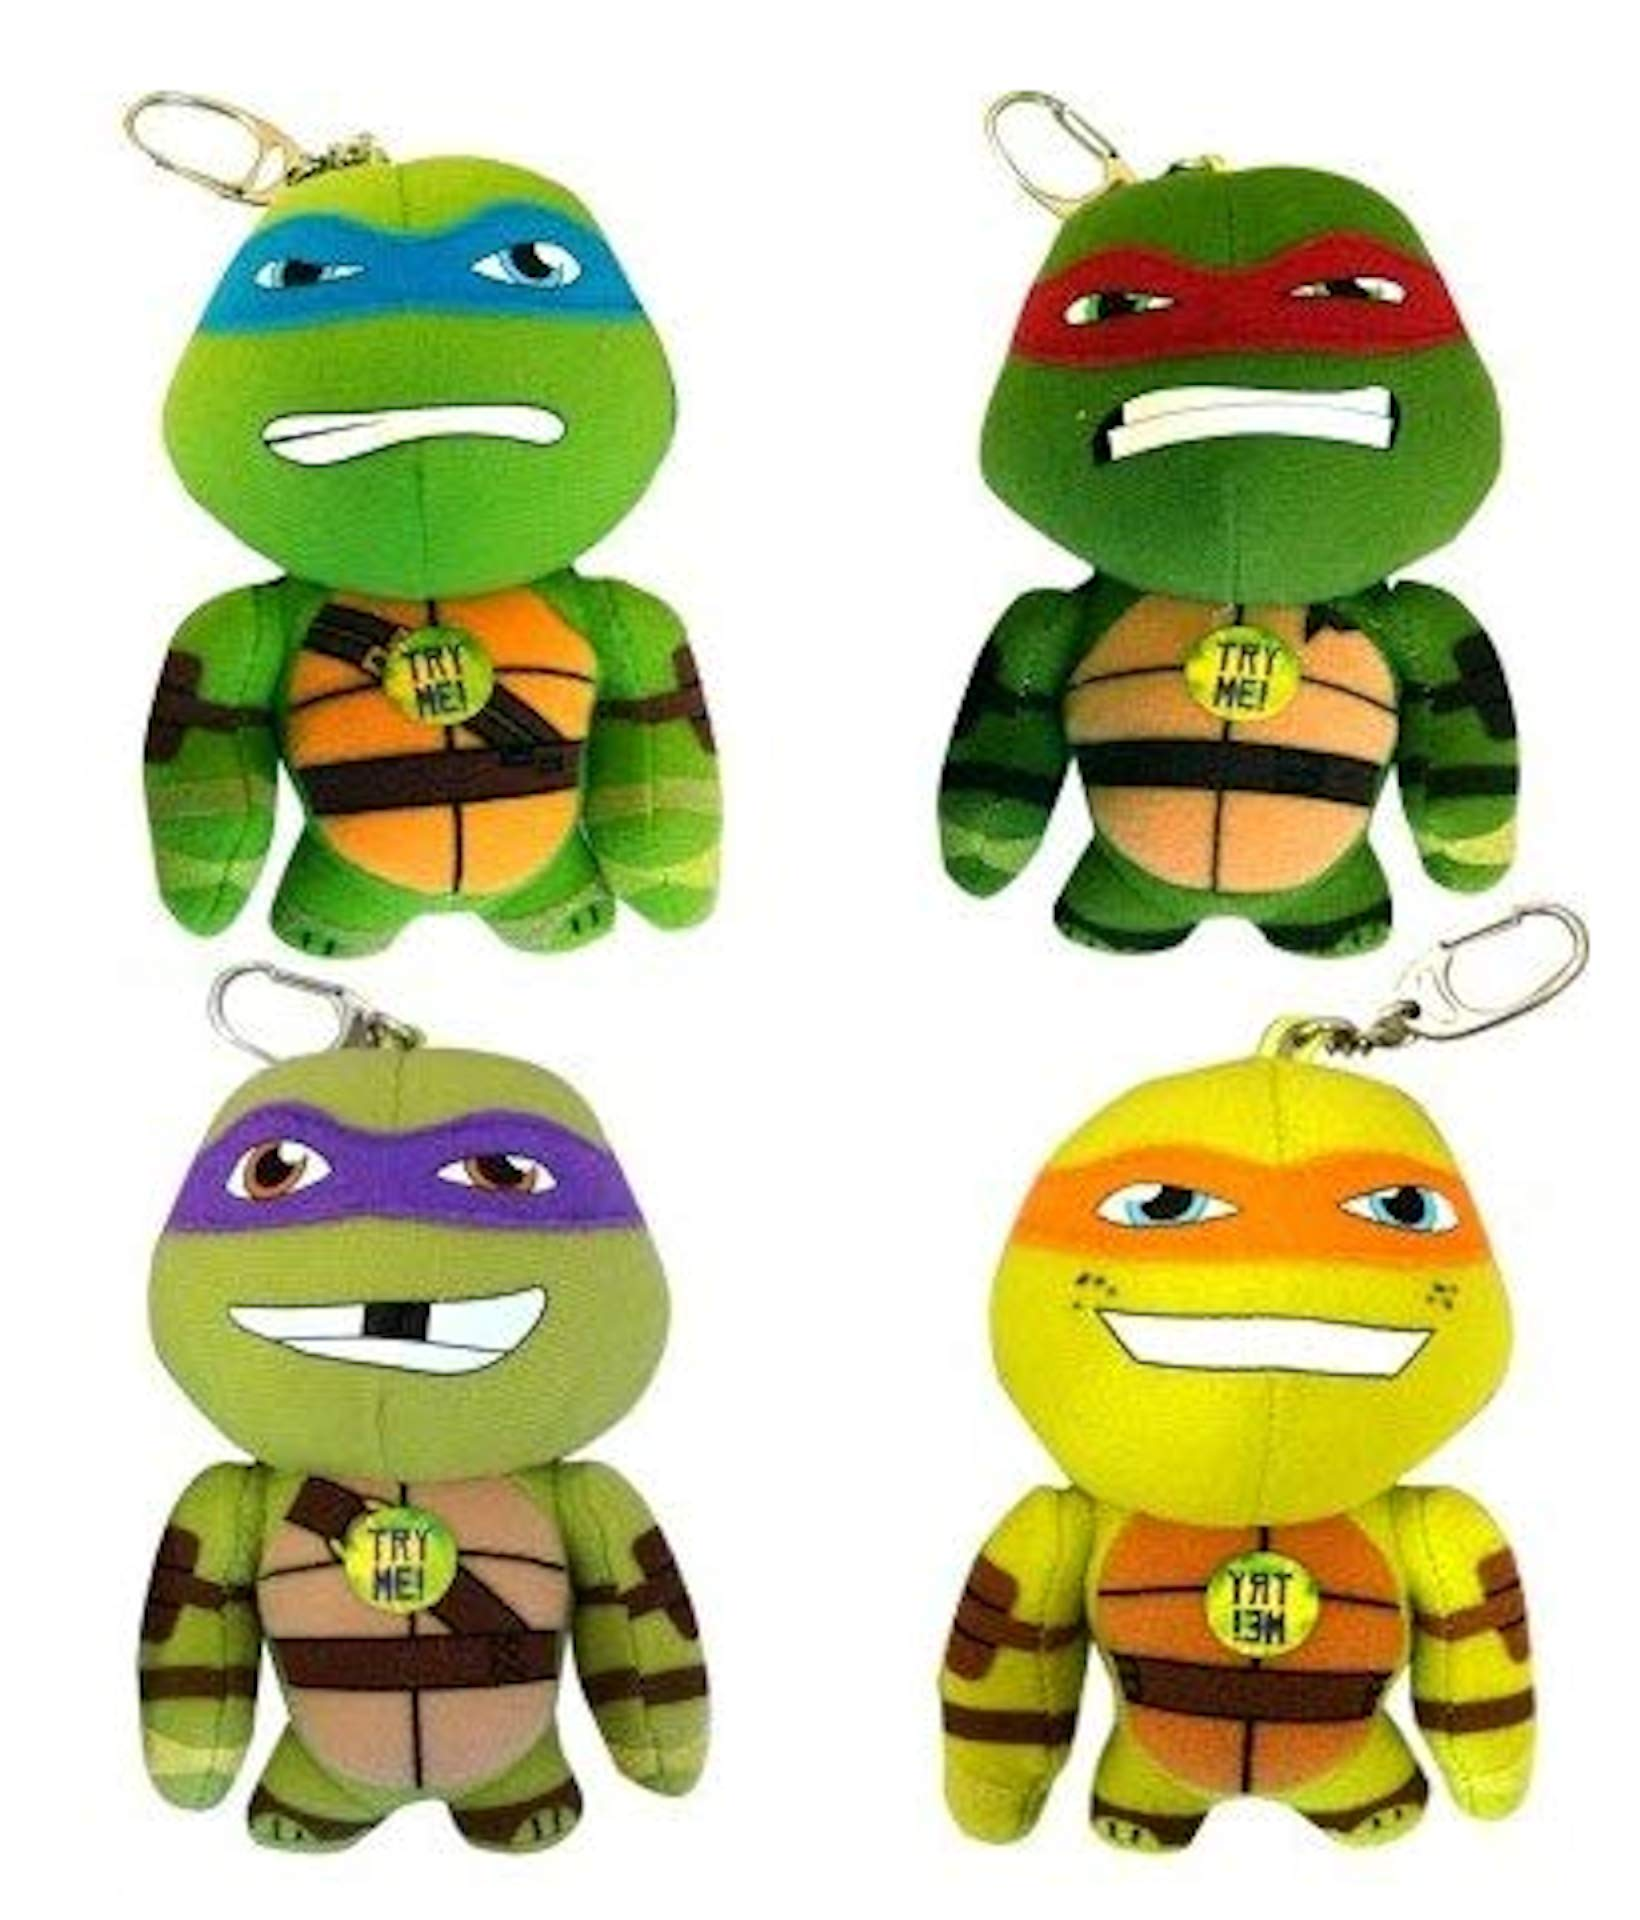 Teenage Mutant Ninja Turtles Talking Bag Clip 4 (Leonardo, Donatello, Raphael, Michelangelo)